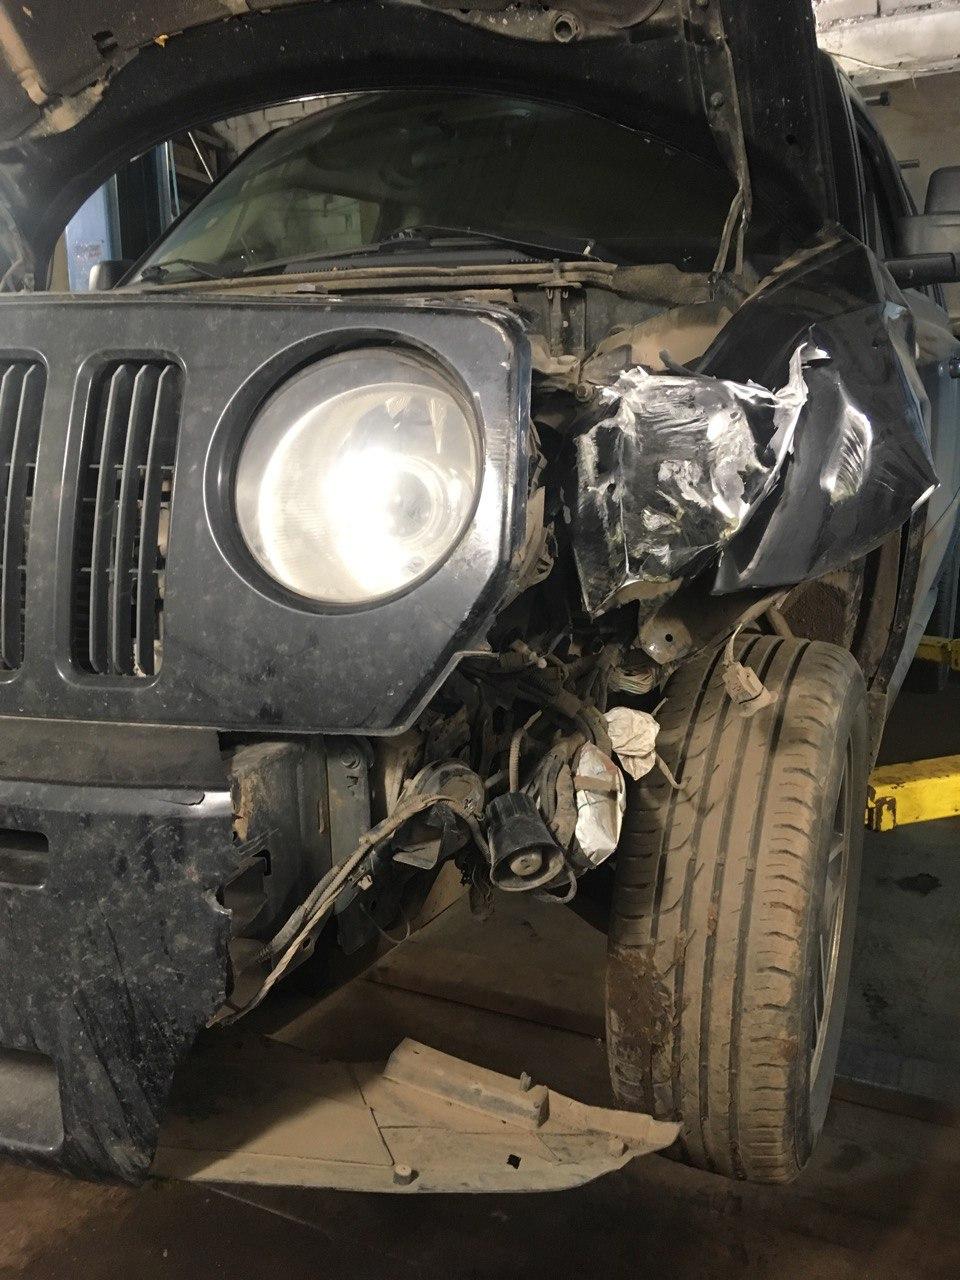 """Территория Jeep"".Запчасти Б/У, NEW, Off-road - Страница 4 59f30110"